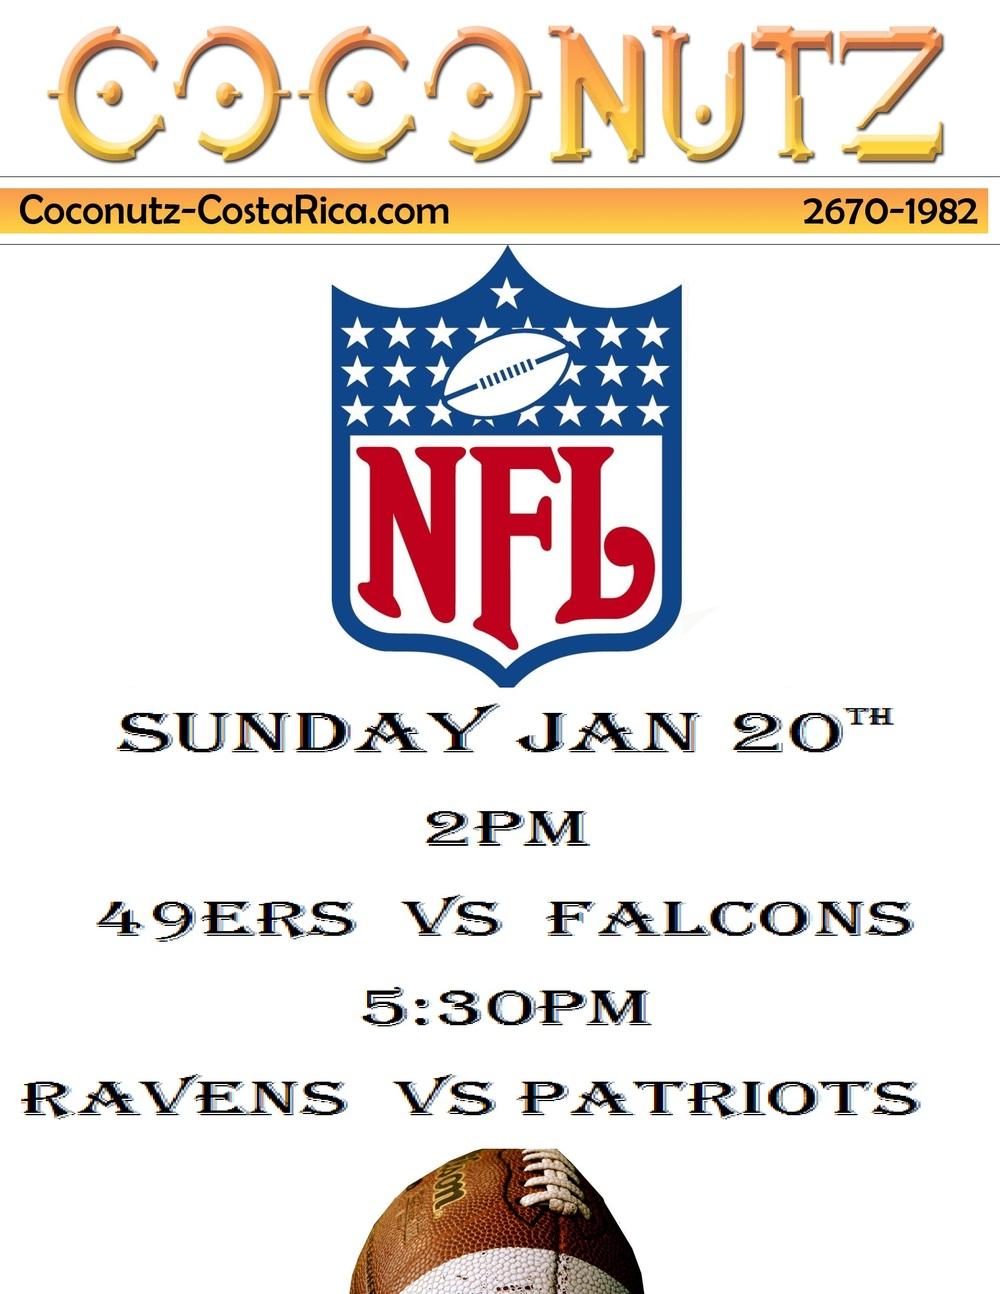 NFL-AFC NFC Playoff.jpg